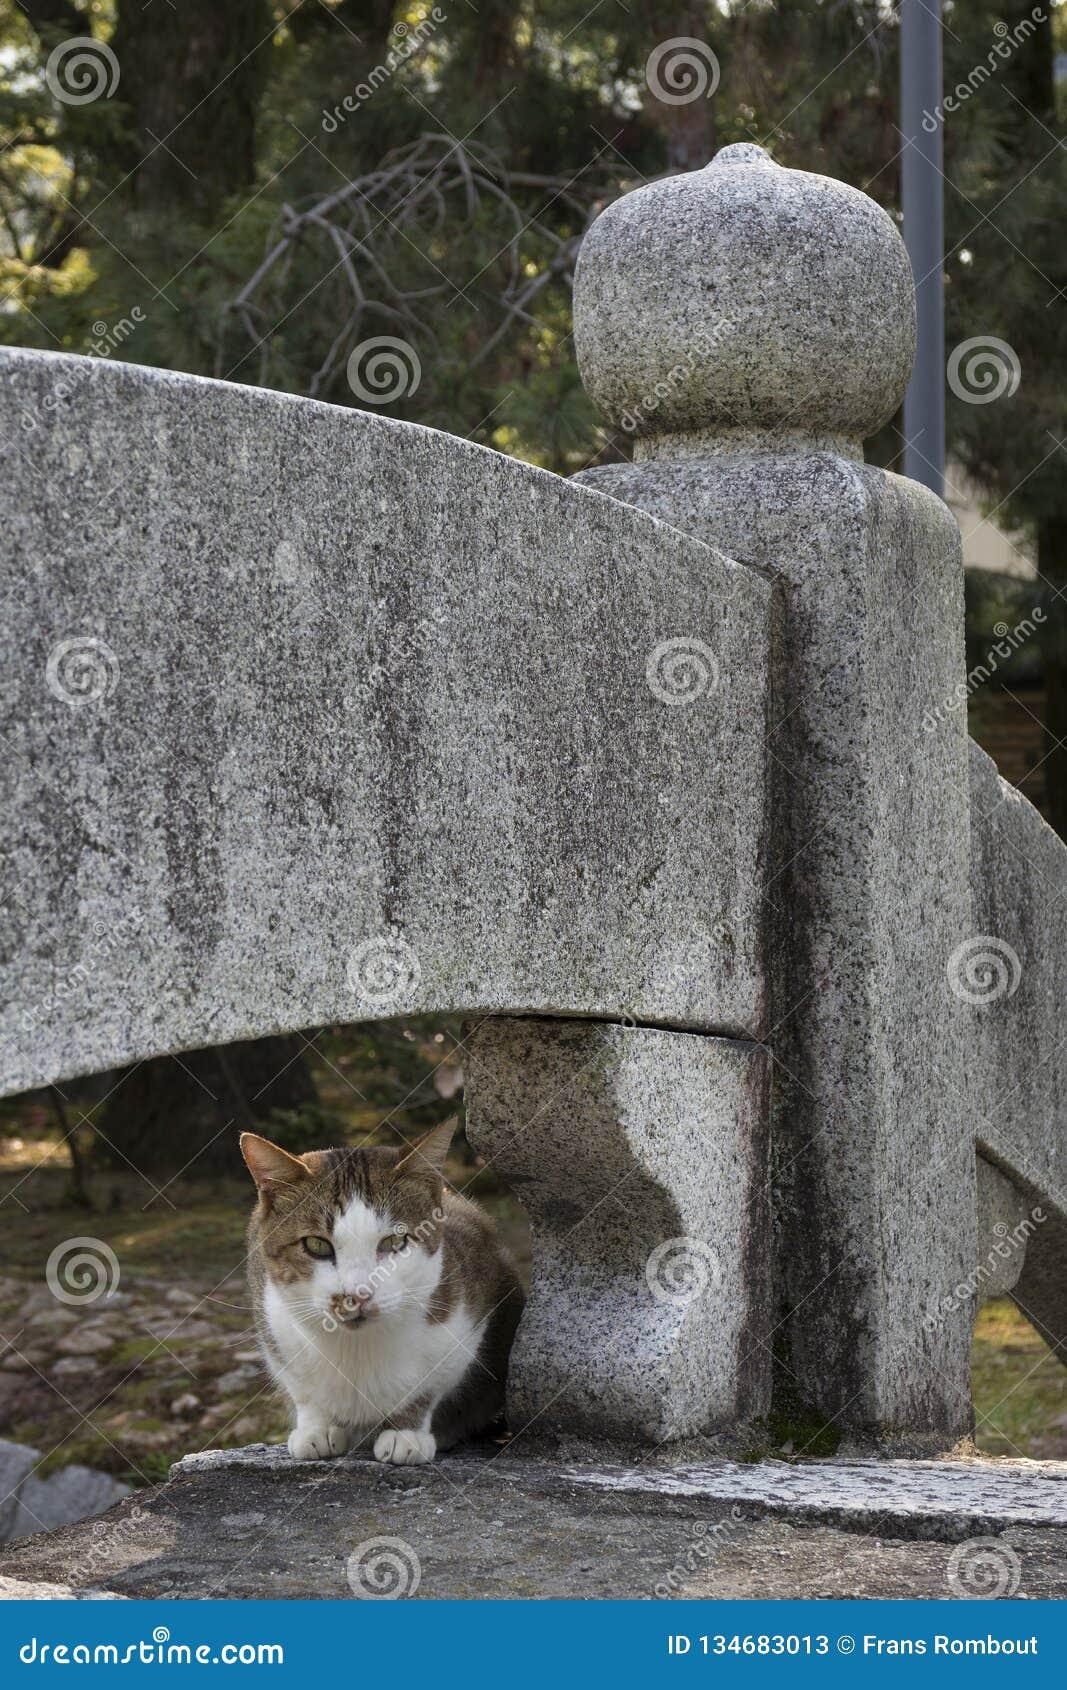 Alley cat sitting on a bridge